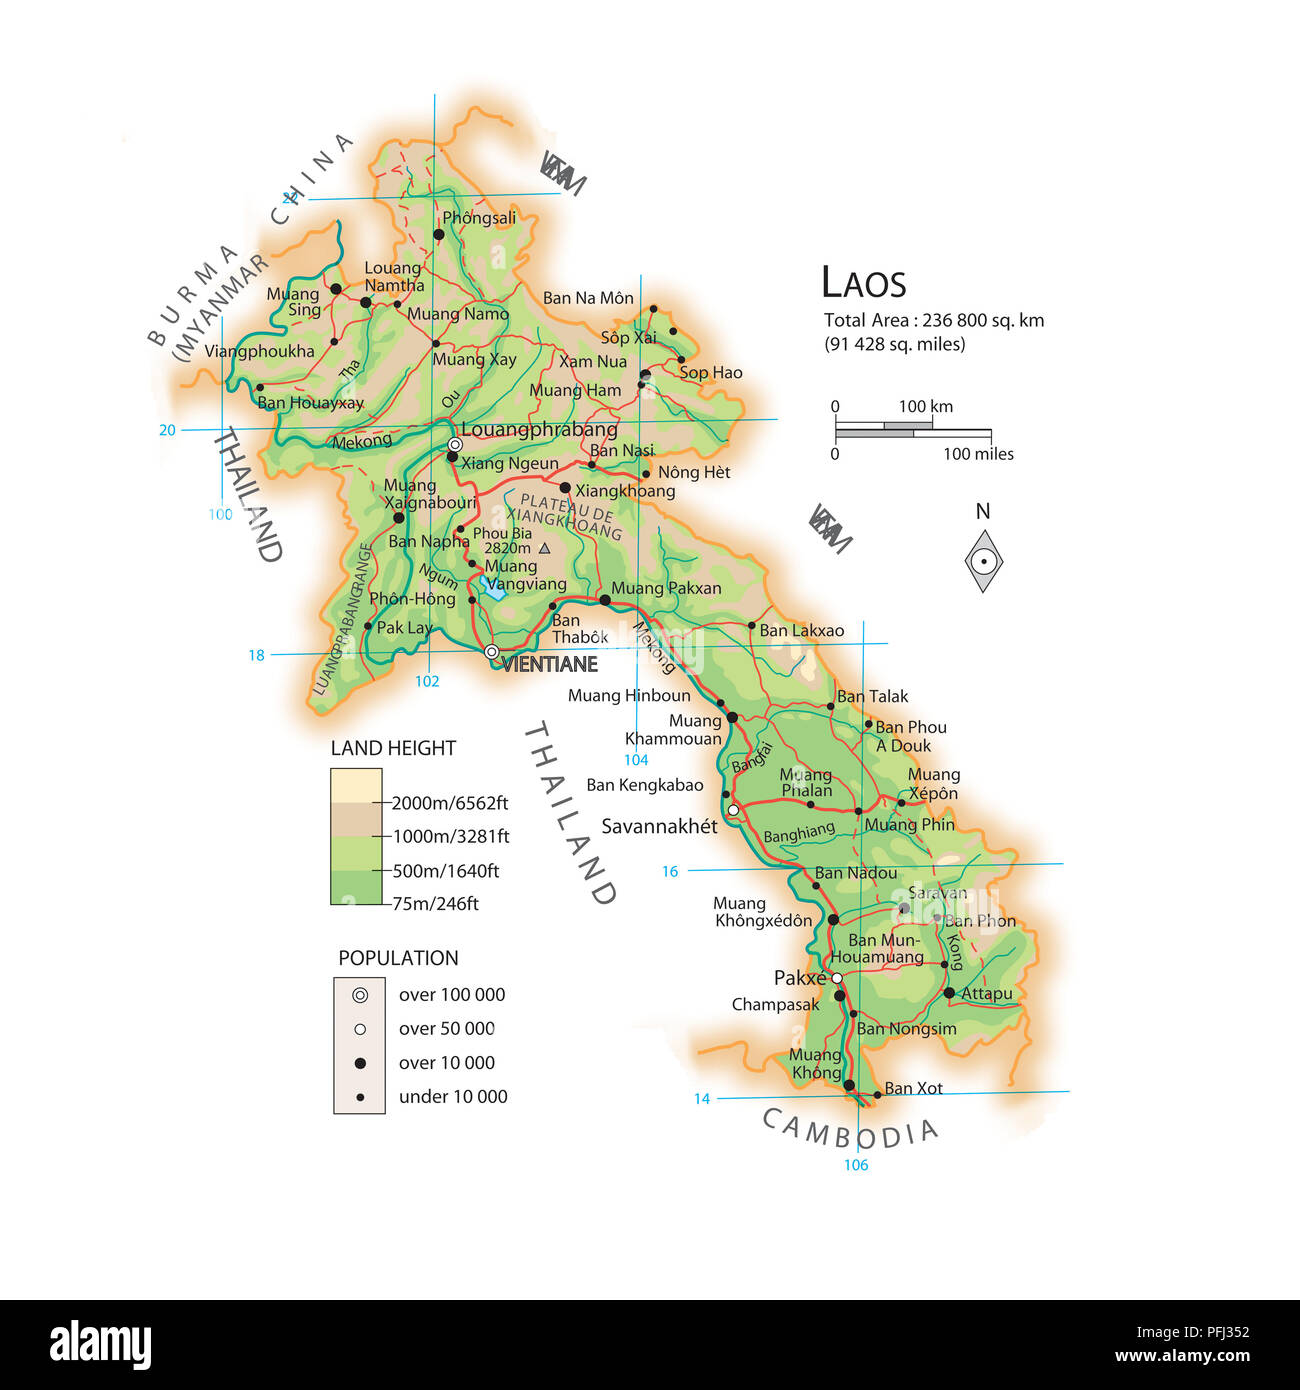 Laos Karte.Karte Von Laos Stockfoto Bild 216141886 Alamy